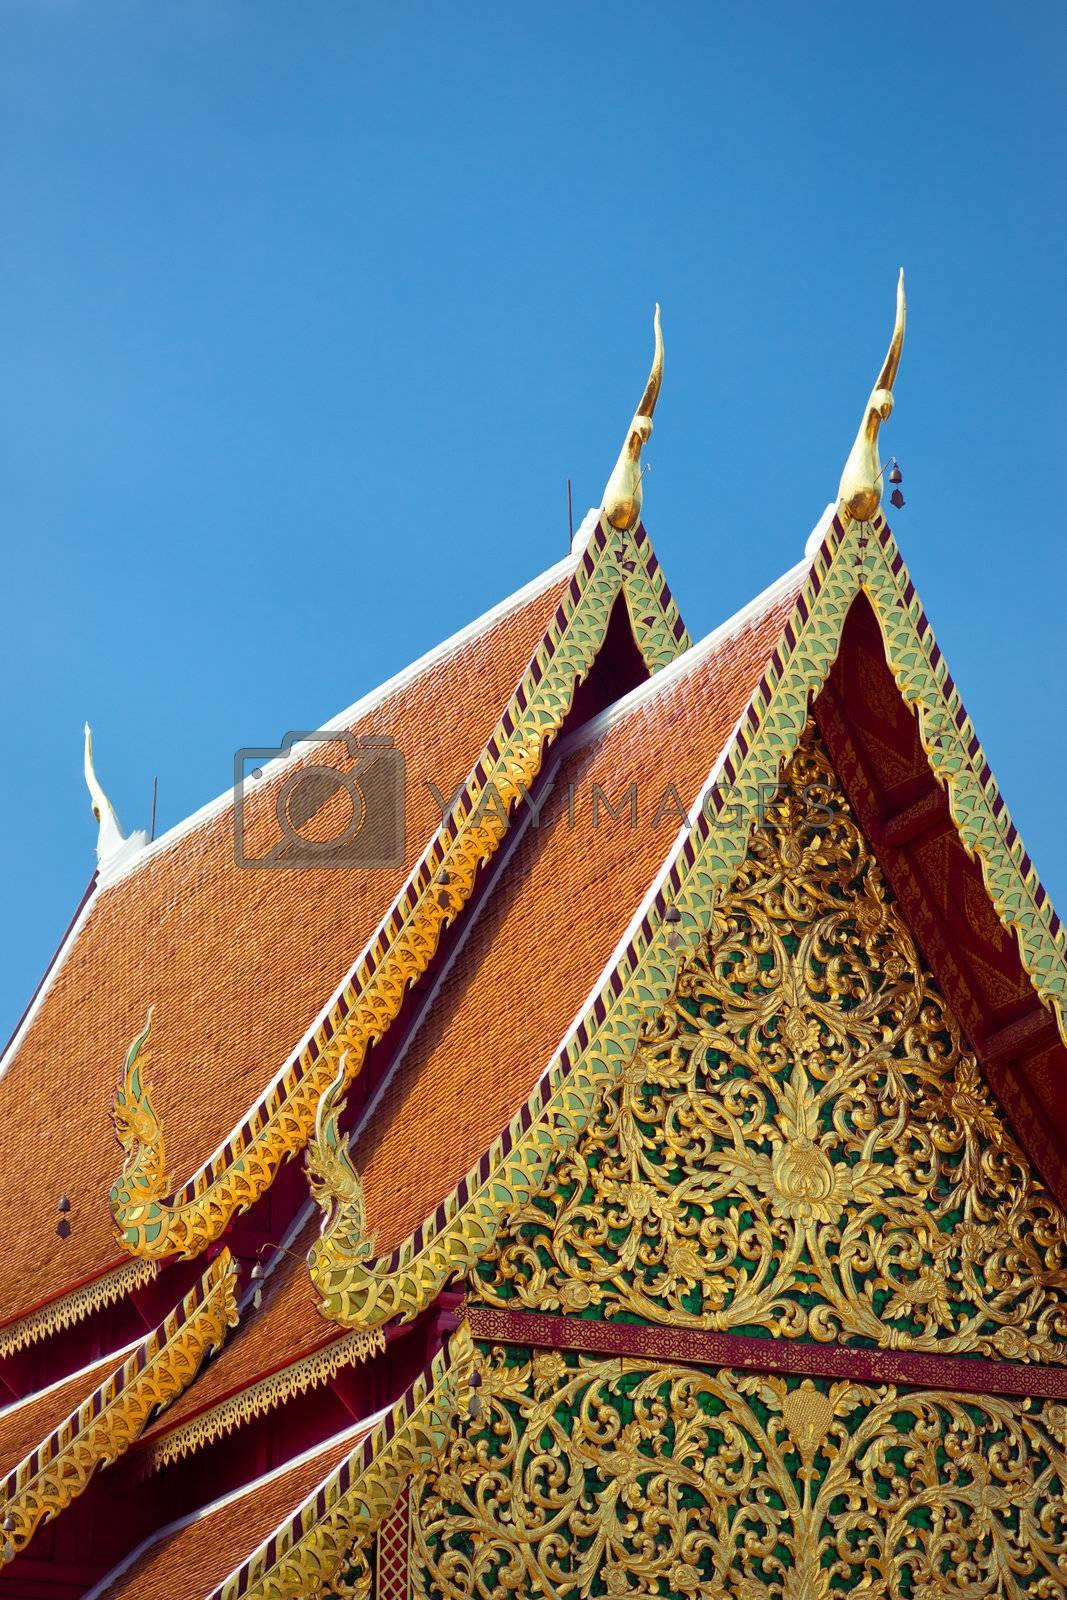 Ornate roof of buddhist temple, Wat Doi Suthep, Chiang Mai, Thailand